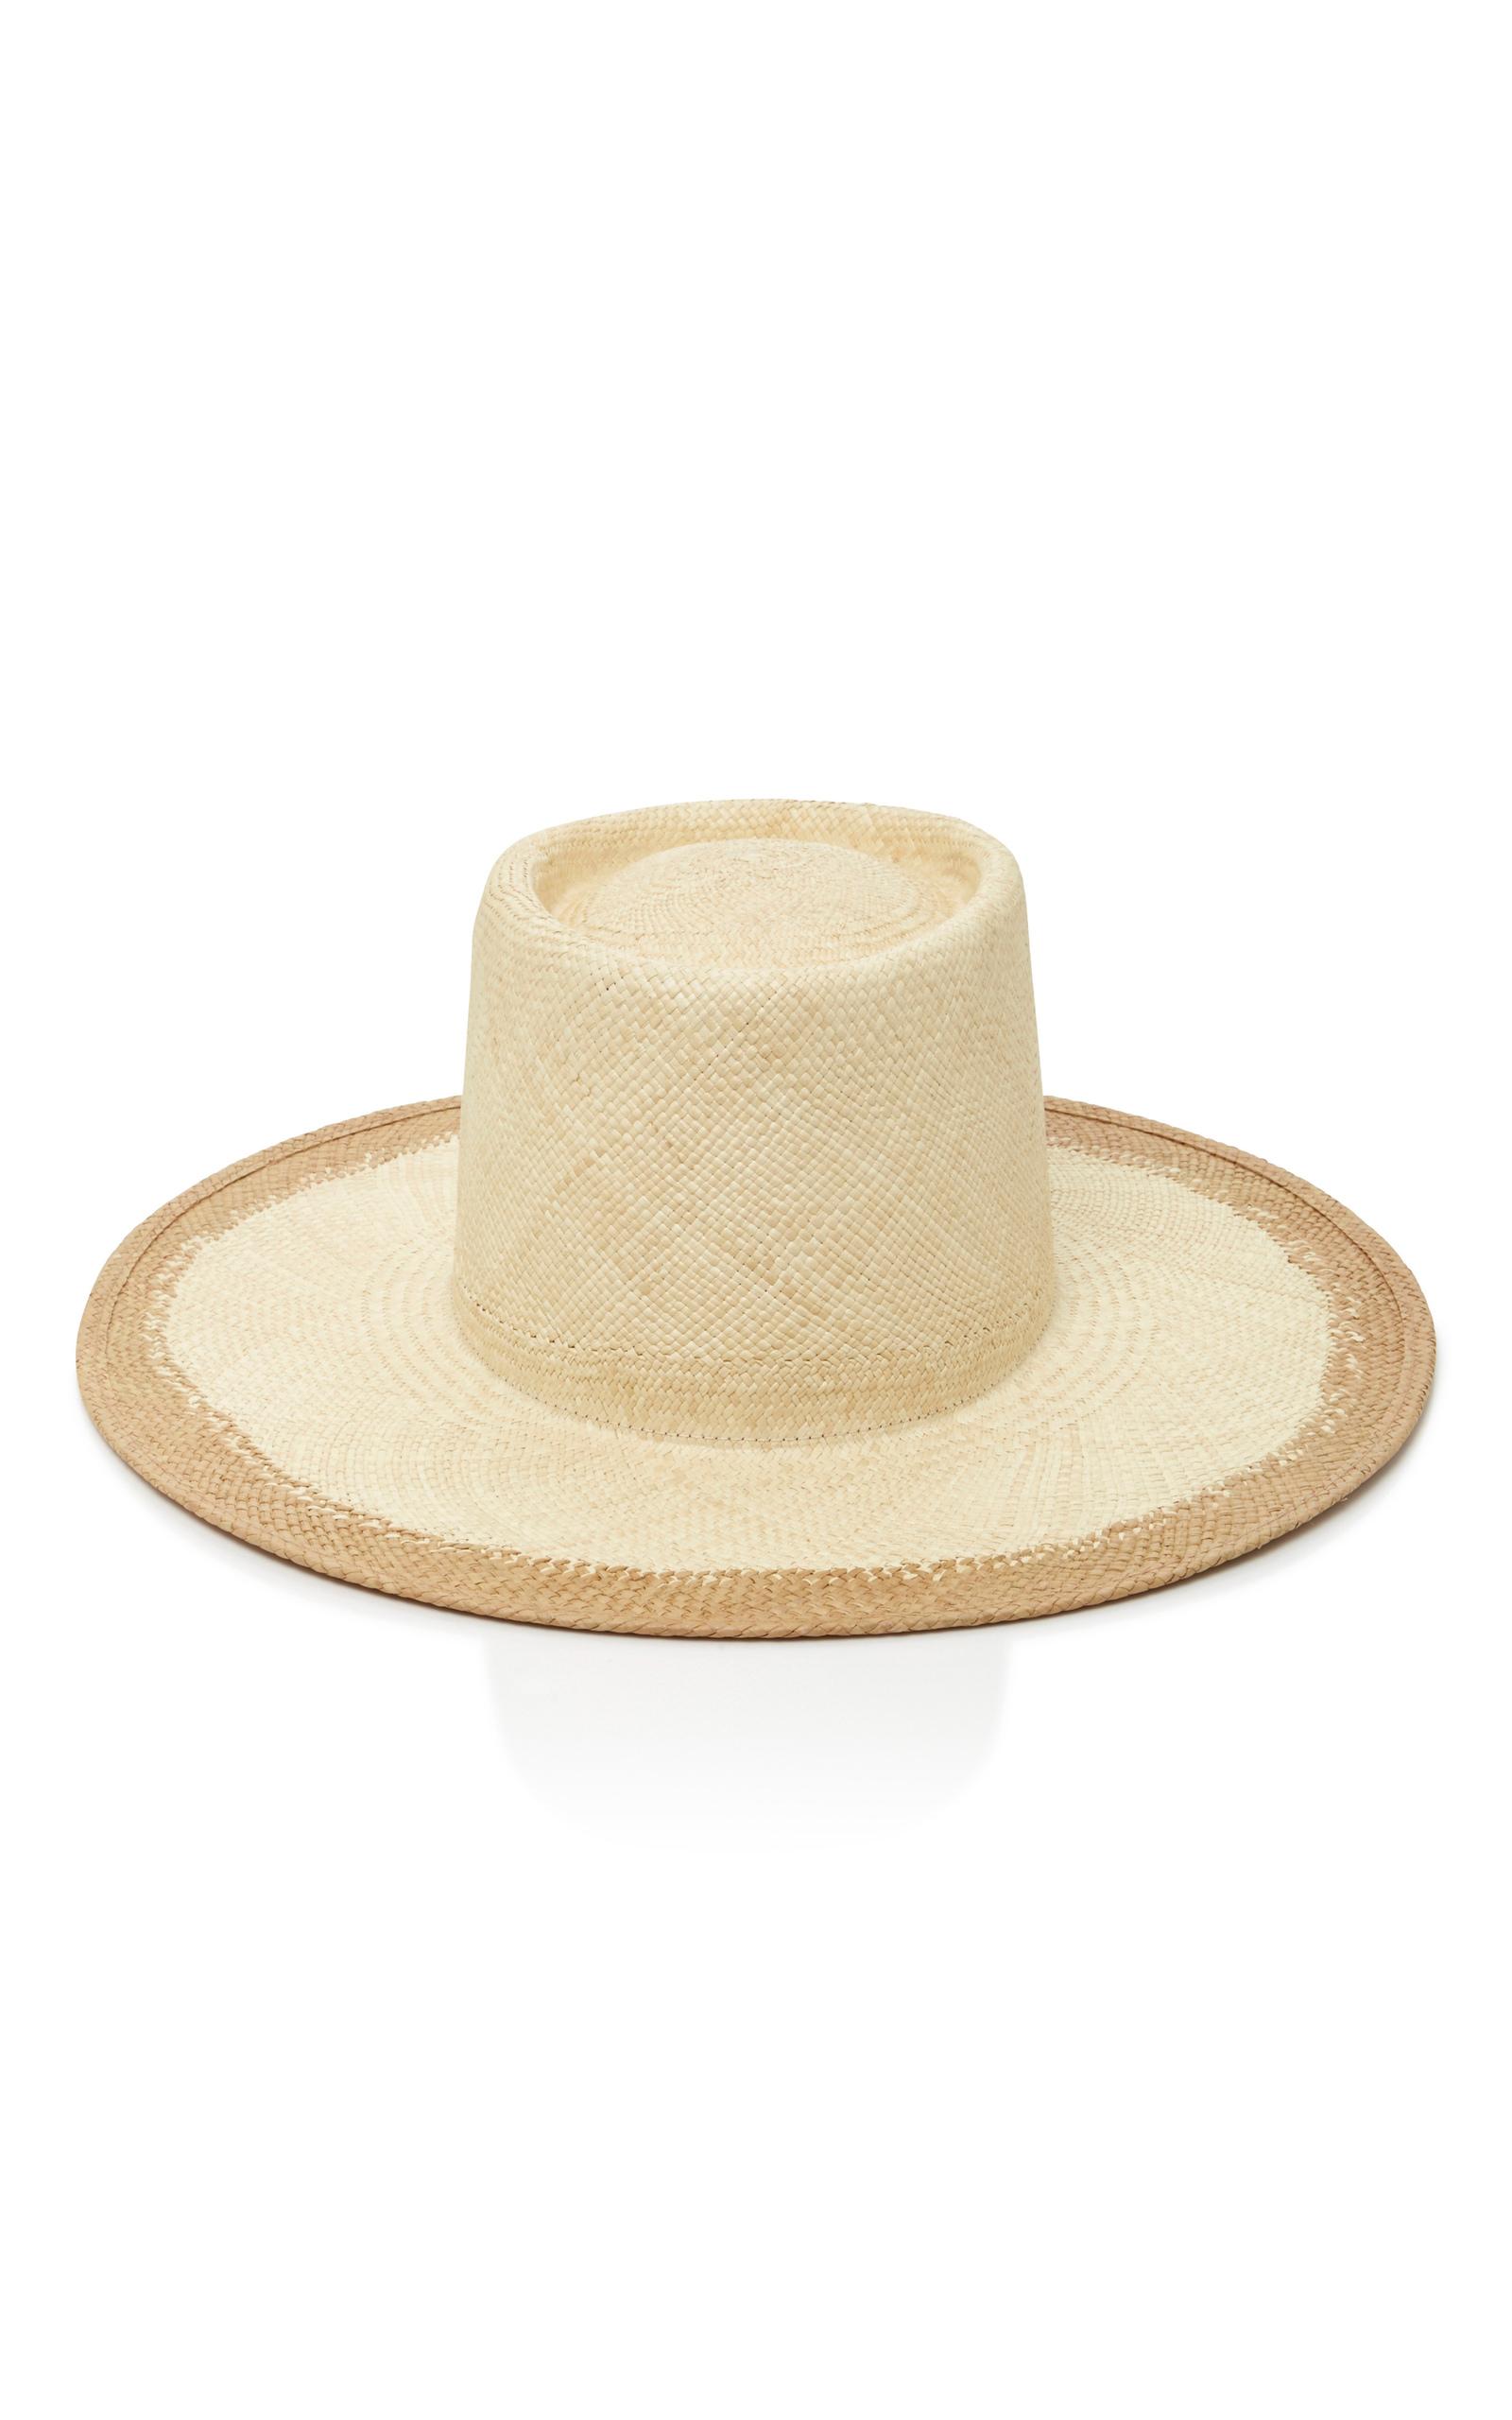 bf90f1924 Straw Panama Hat